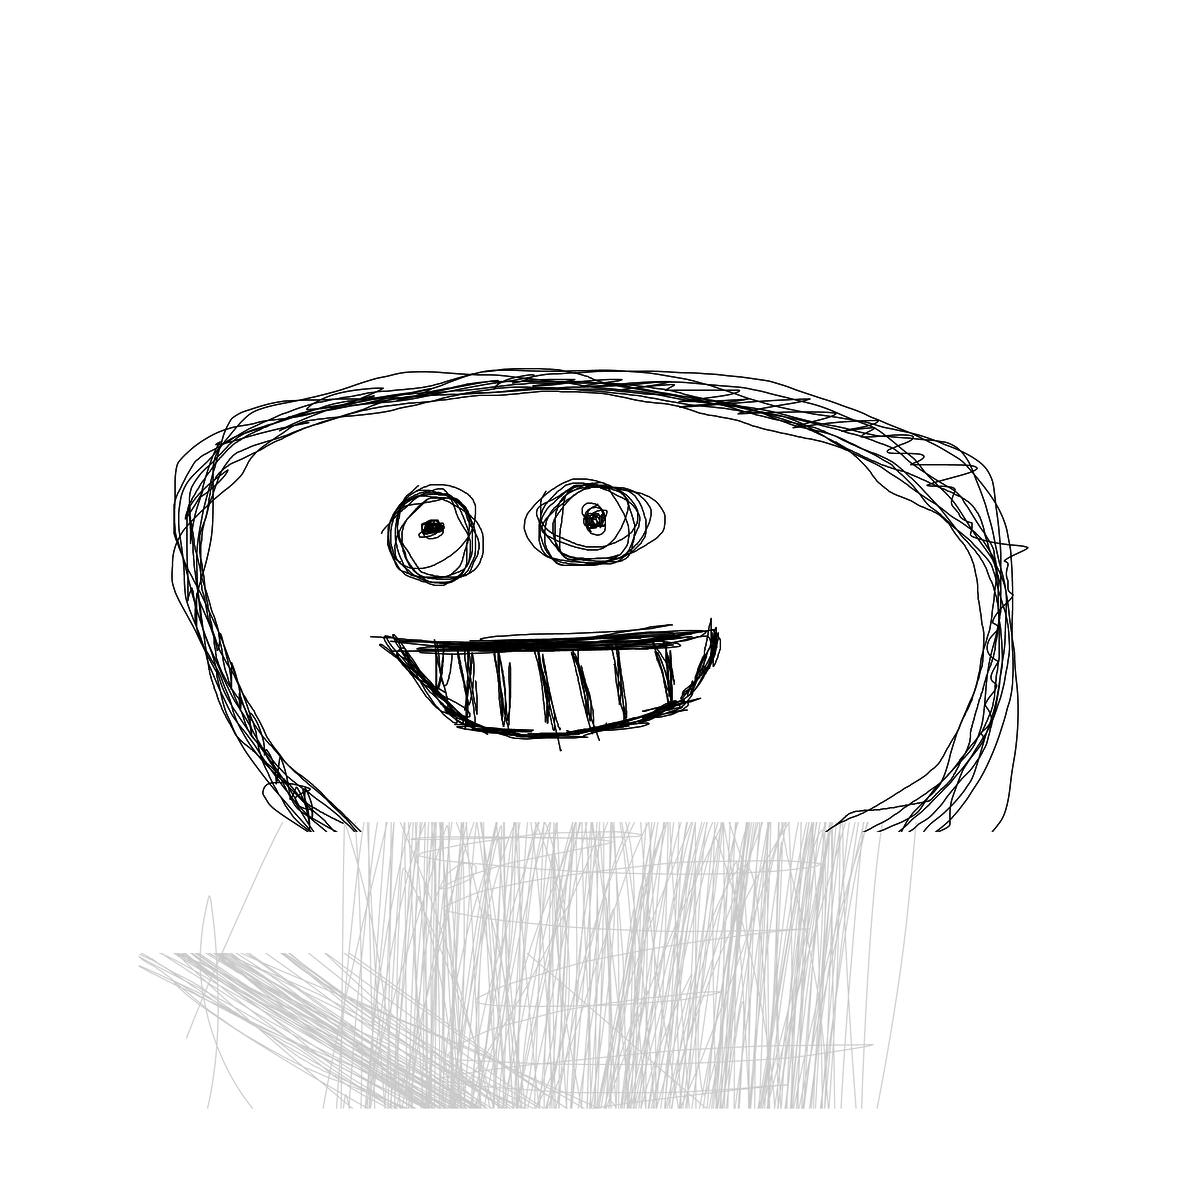 BAAAM drawing#19198 lat:60.3898468017578100lng: 25.6664638519287100